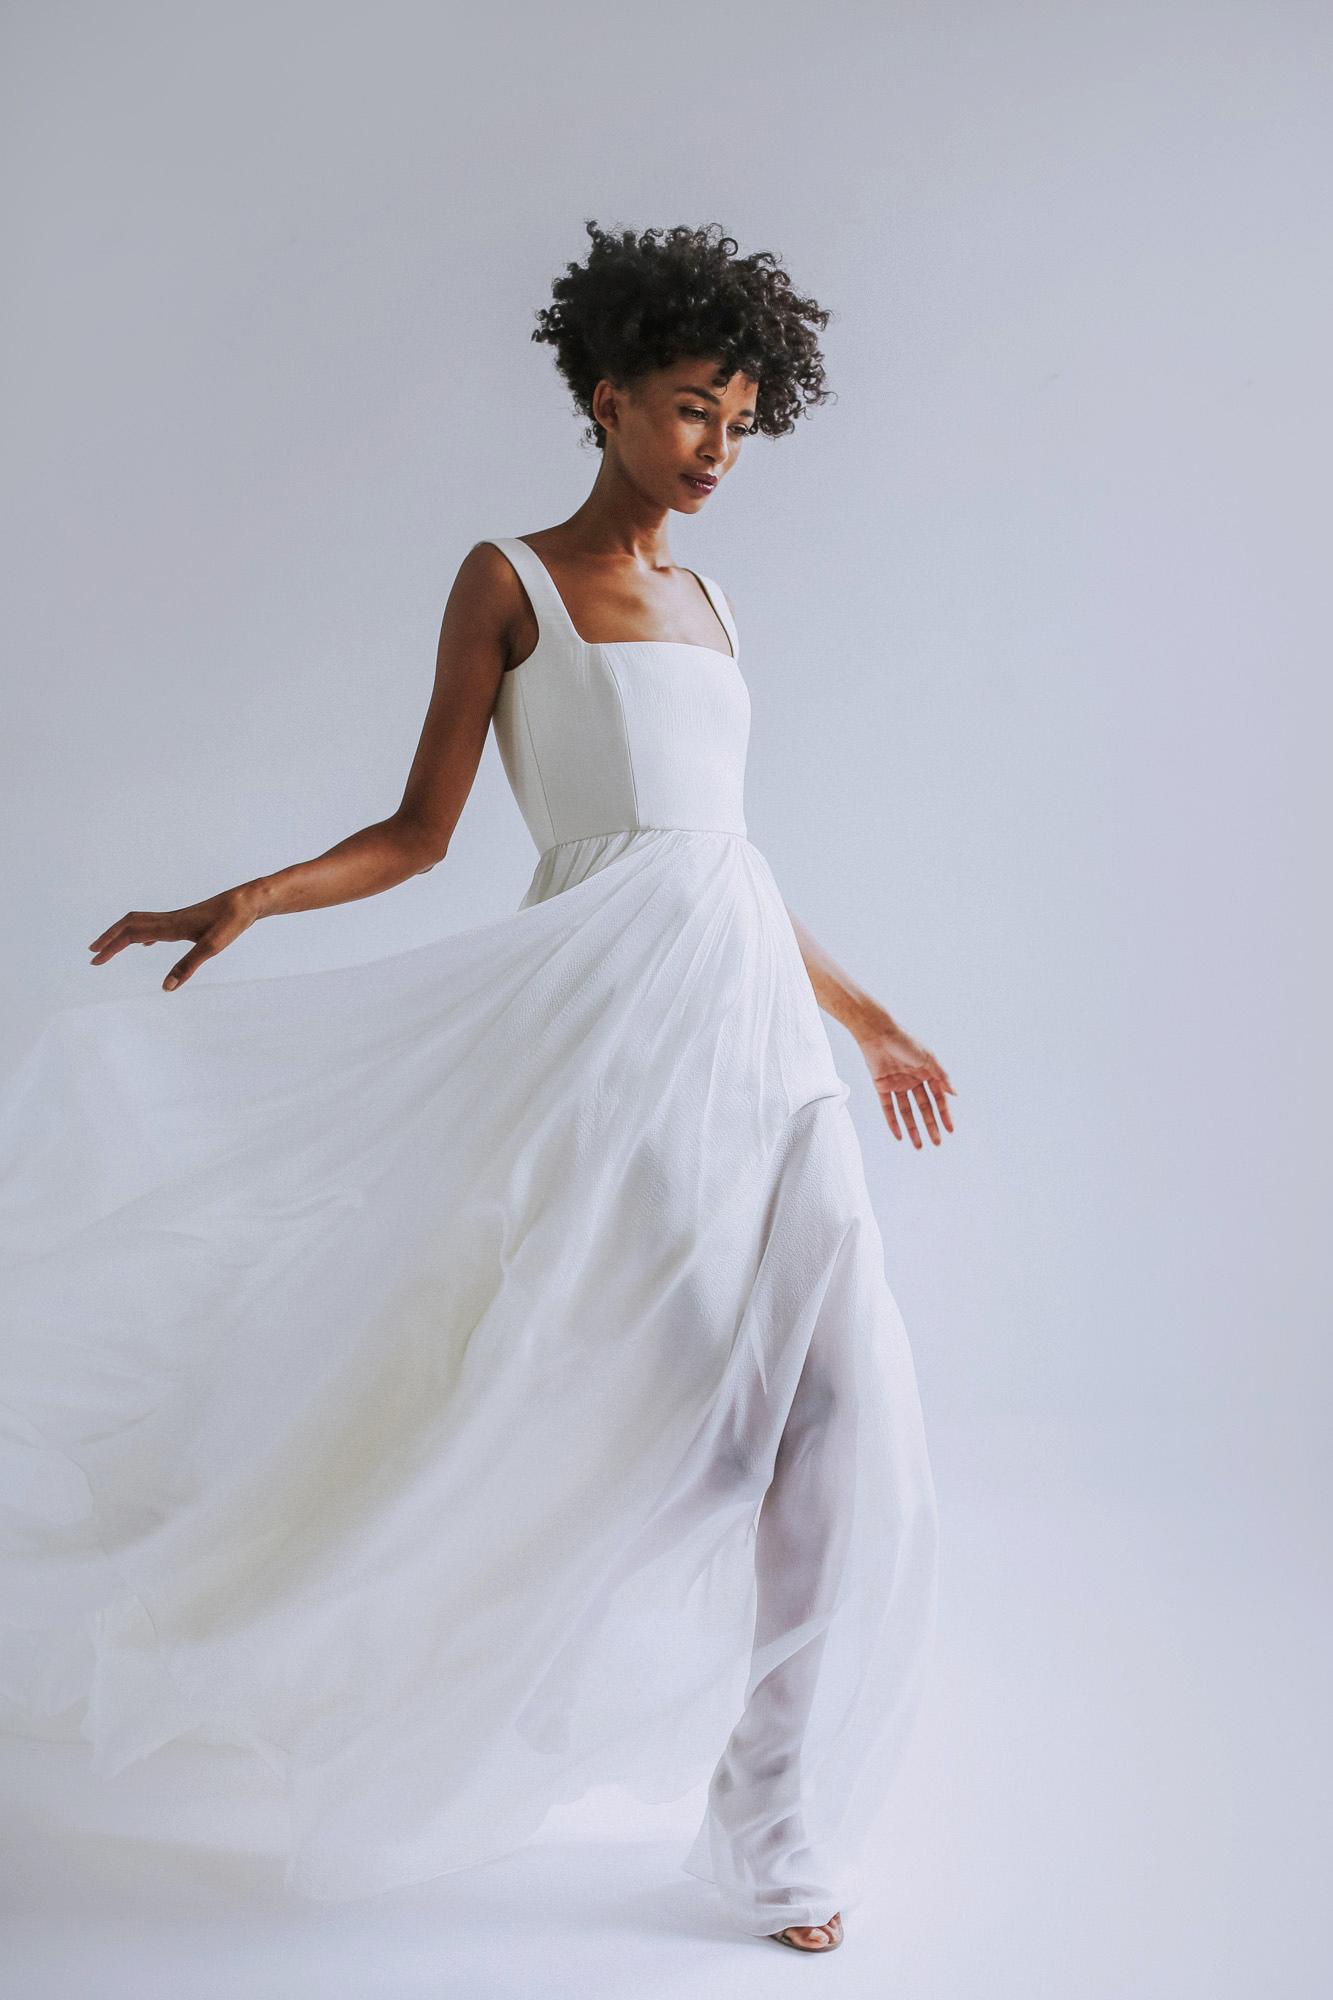 Leanne Marshall wedding dress with sheer skirt fall 2019